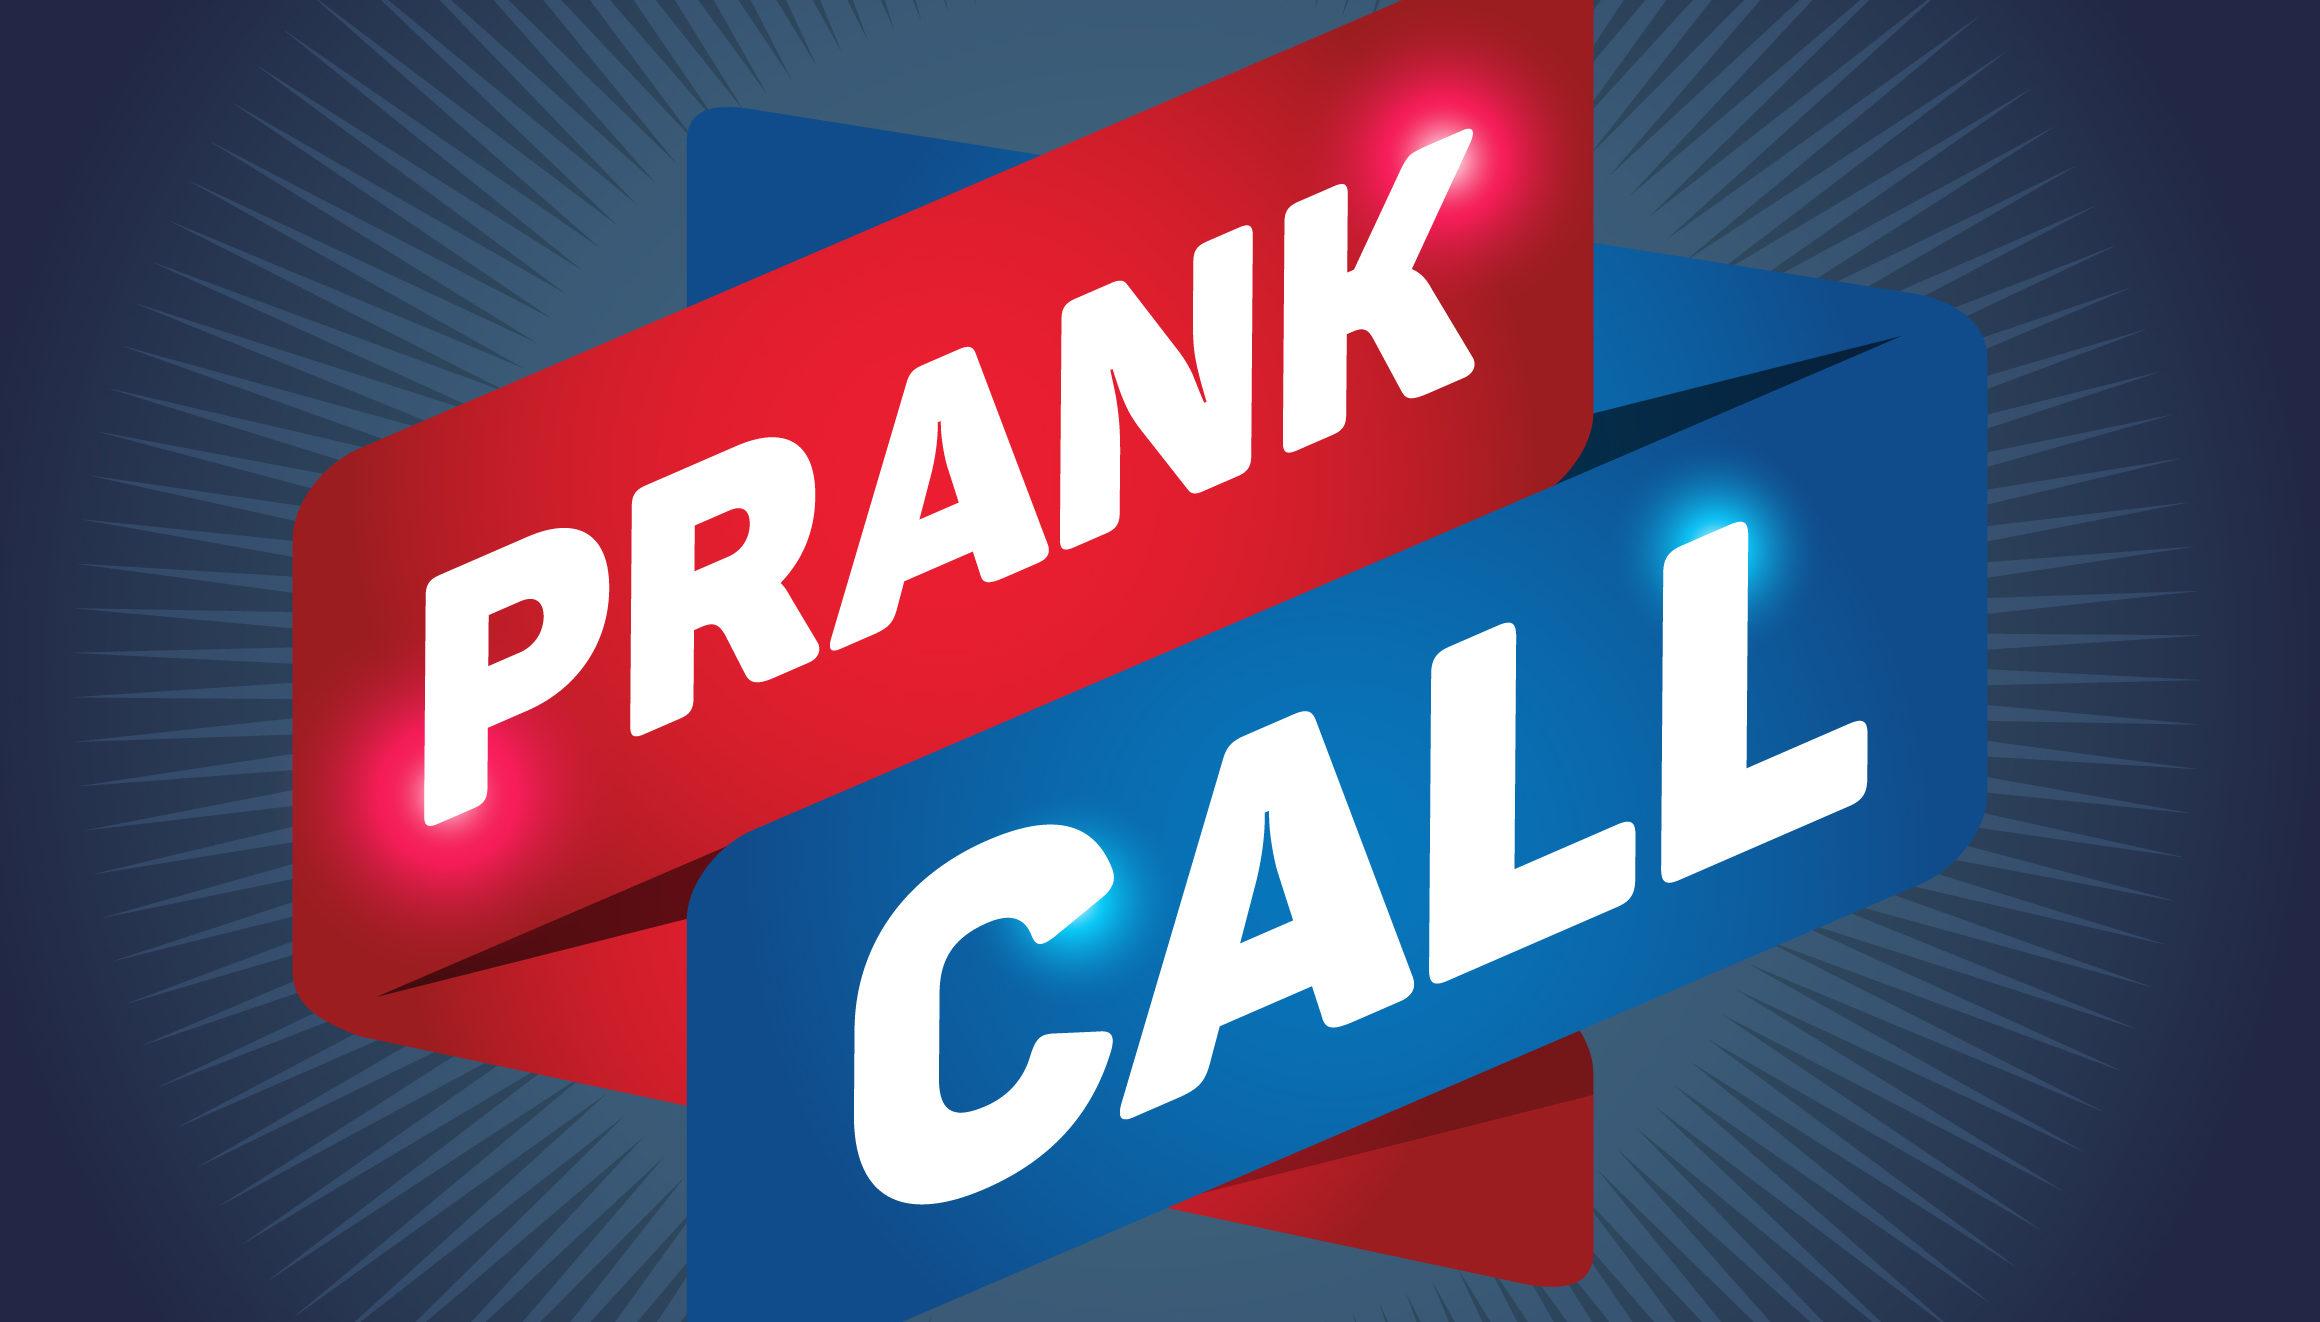 Trump Prank Call